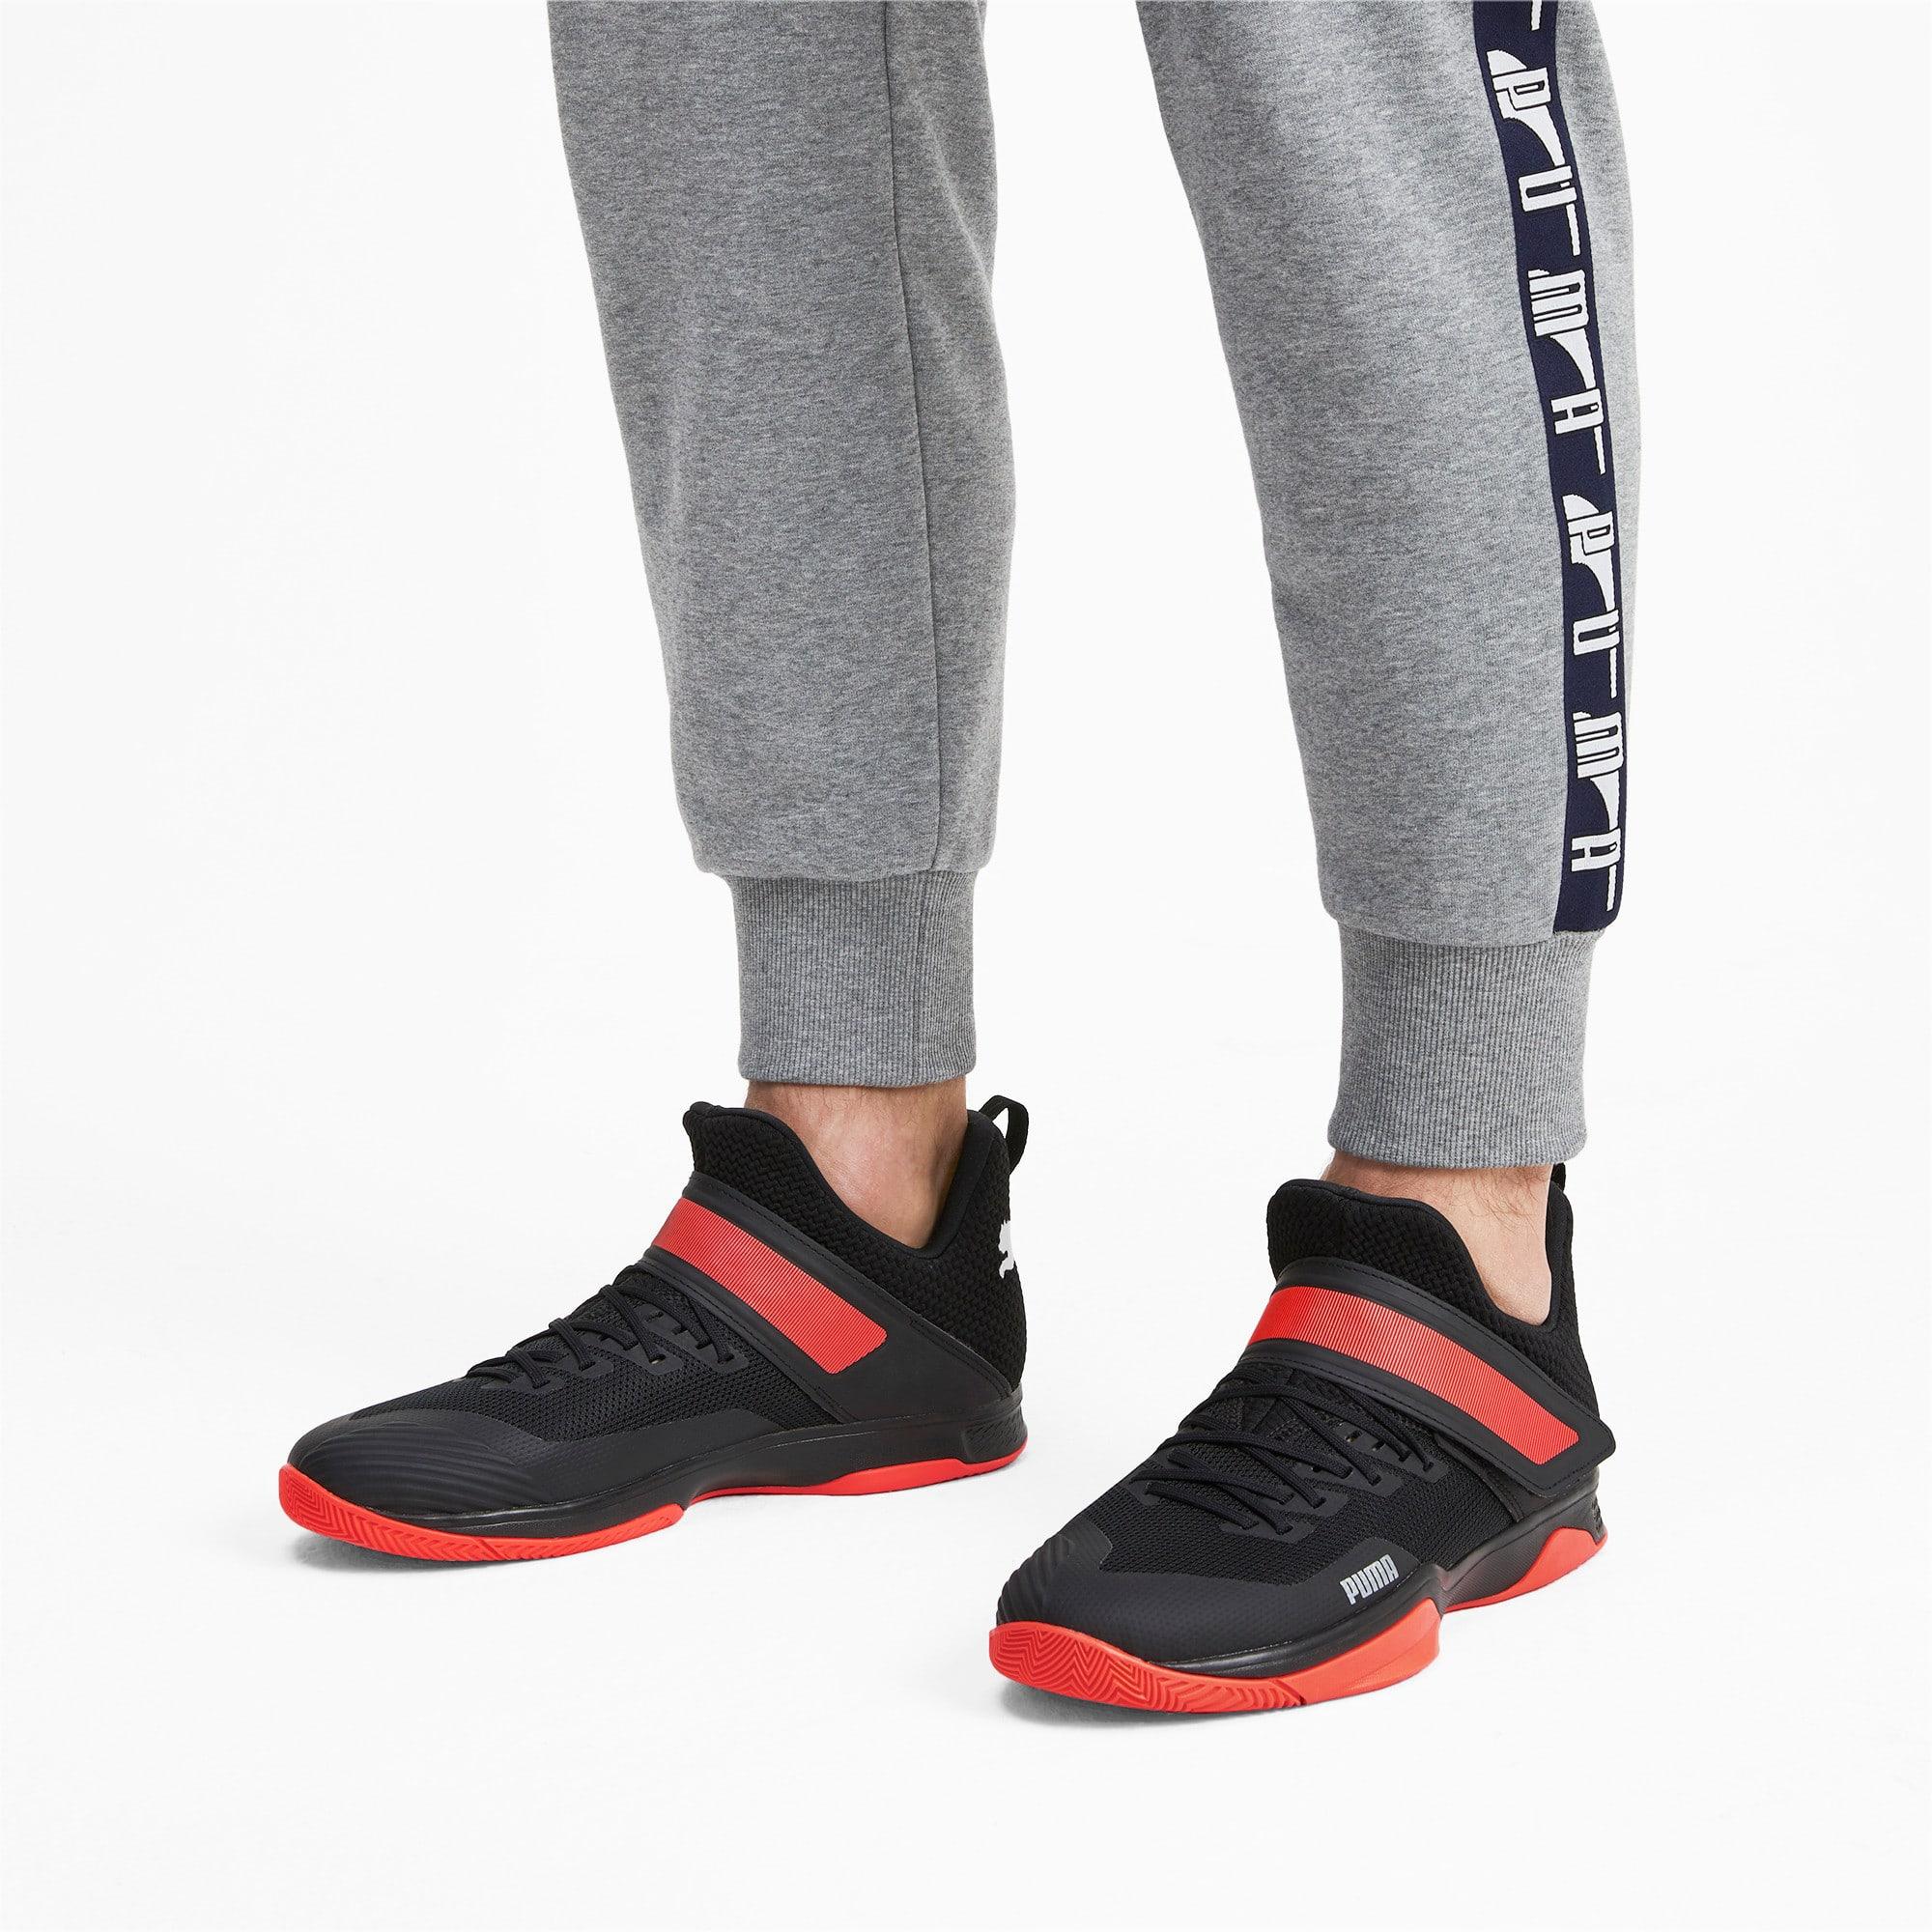 Thumbnail 2 of Chaussures Handball Rise XT3, Puma Black-Silver-Nrgy Red, medium